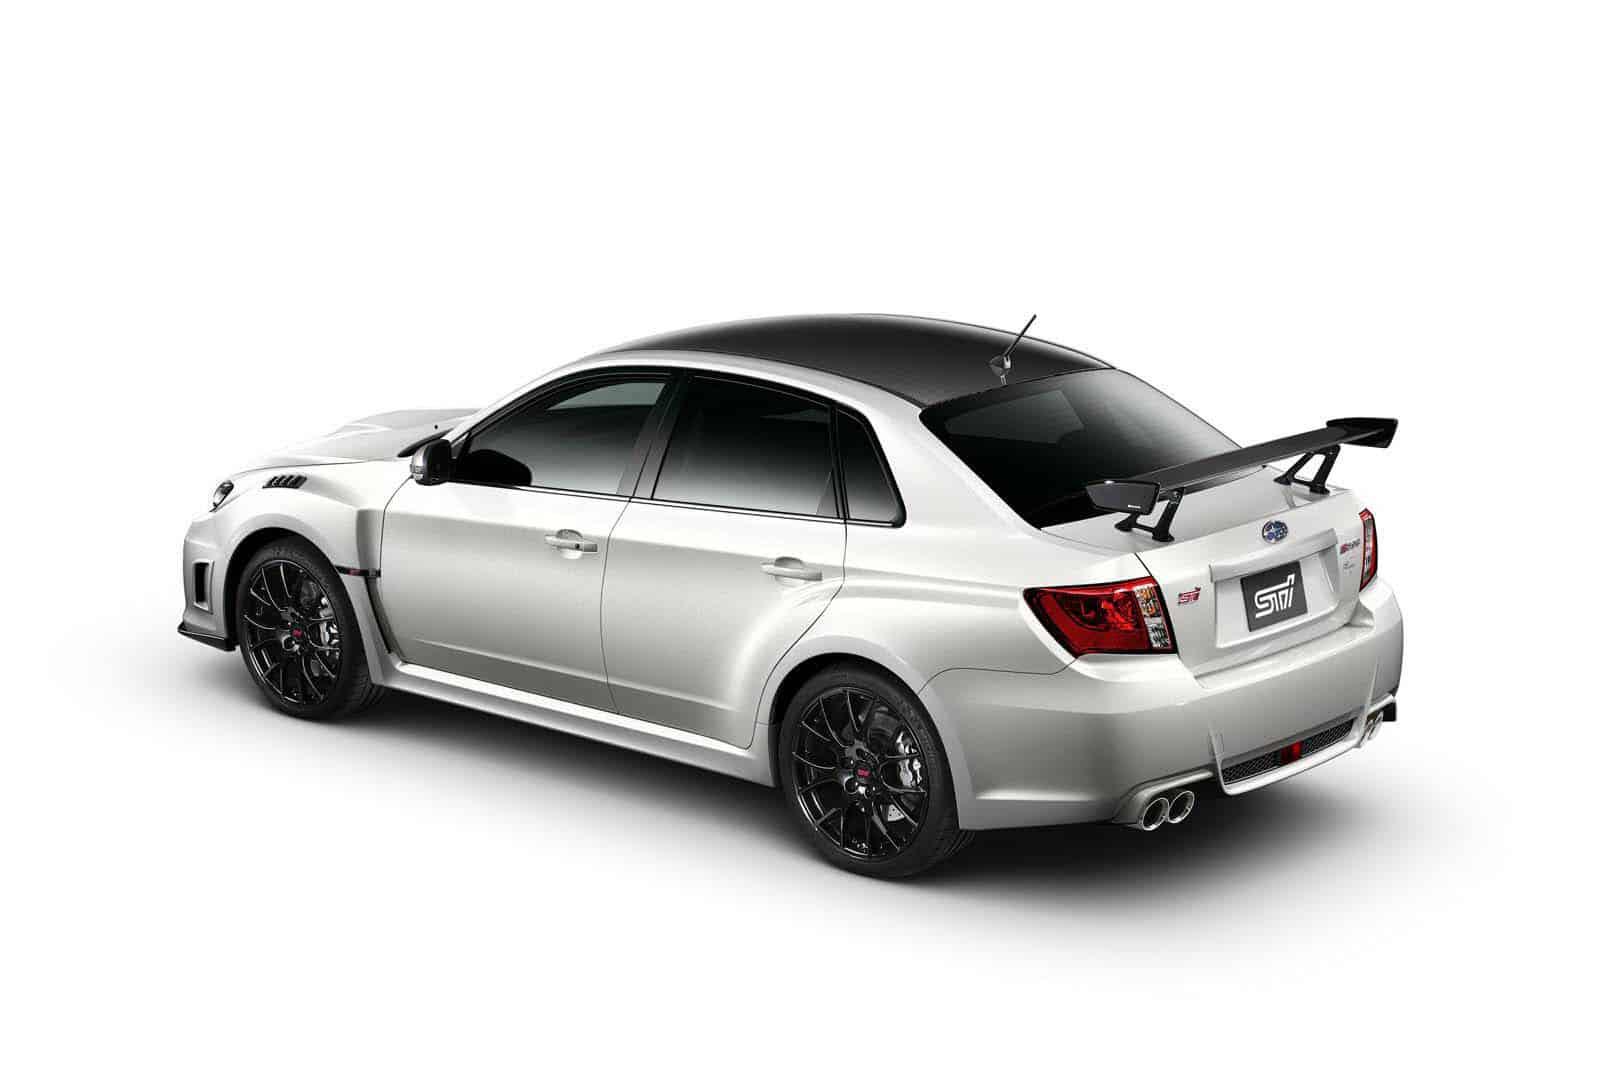 Subaru Impreza WRX STi S206 NBR Challenge Rear